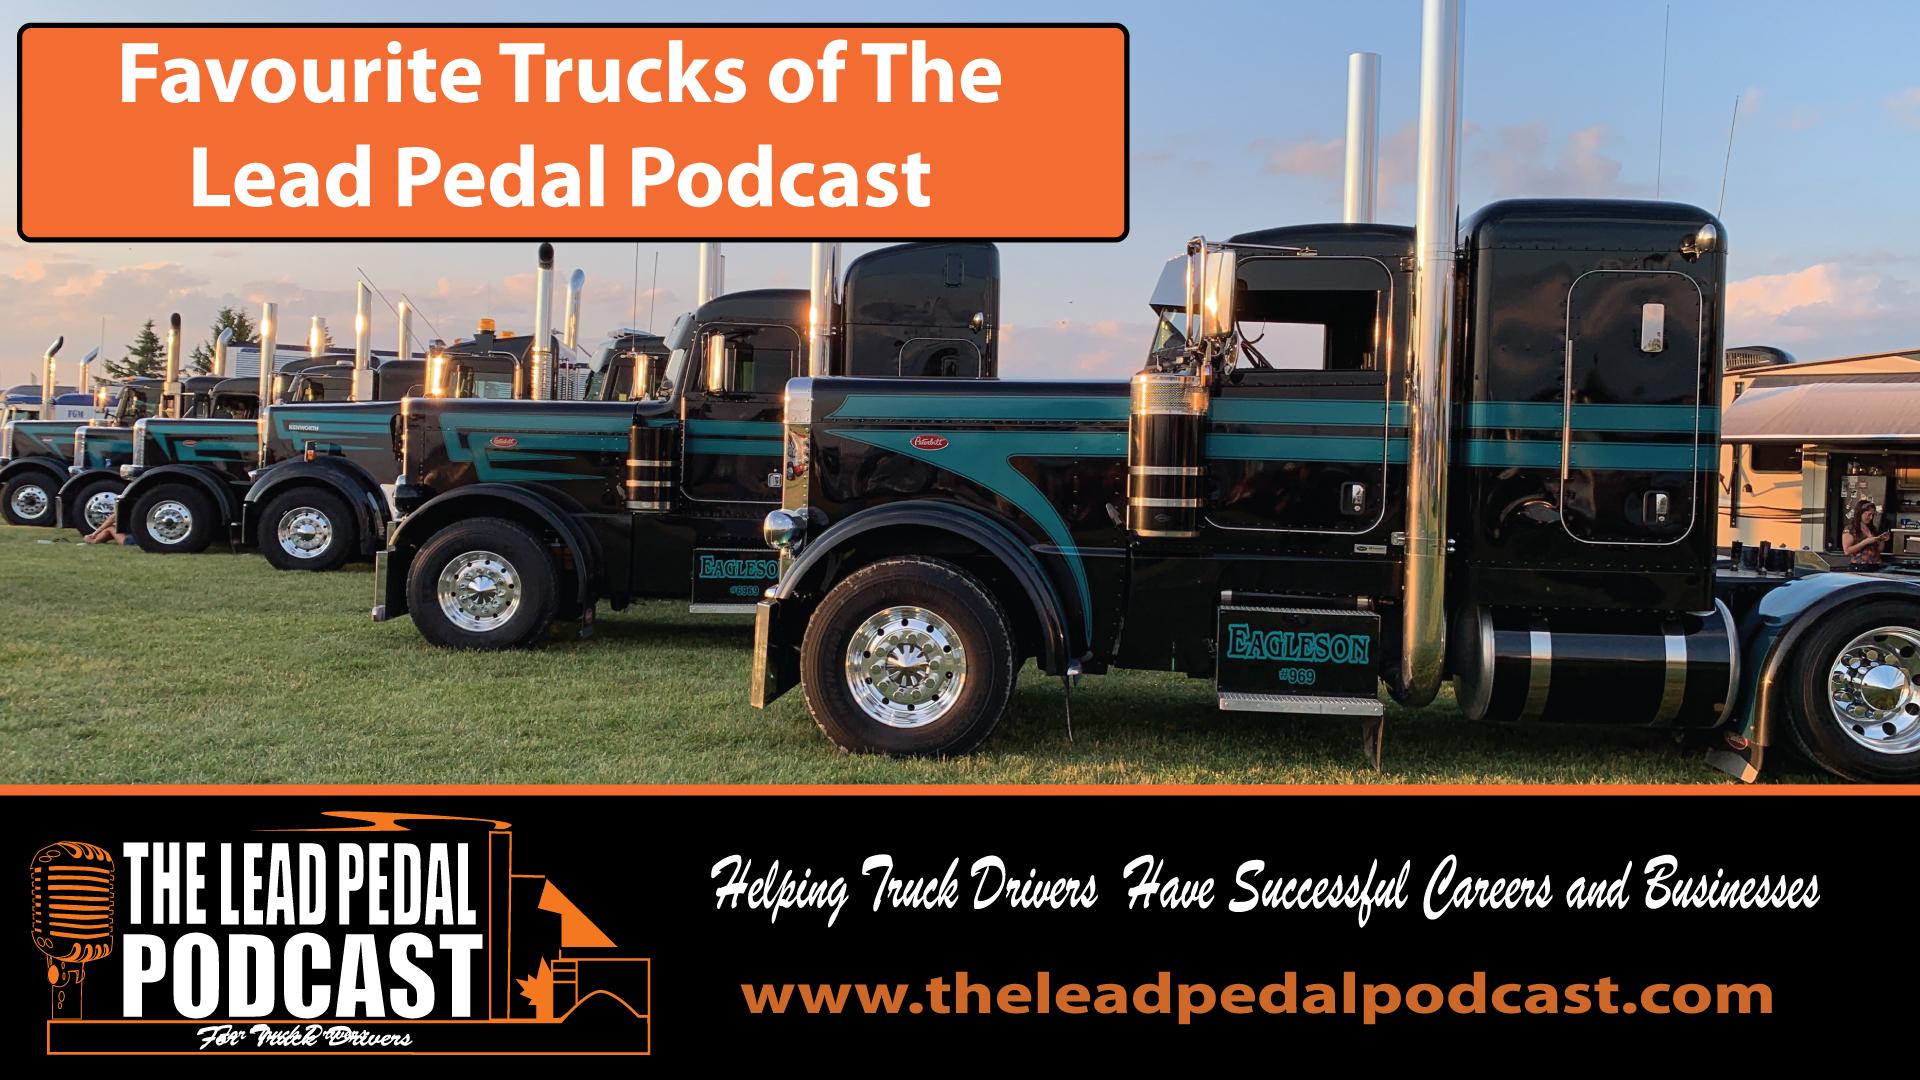 Favourite Trucks